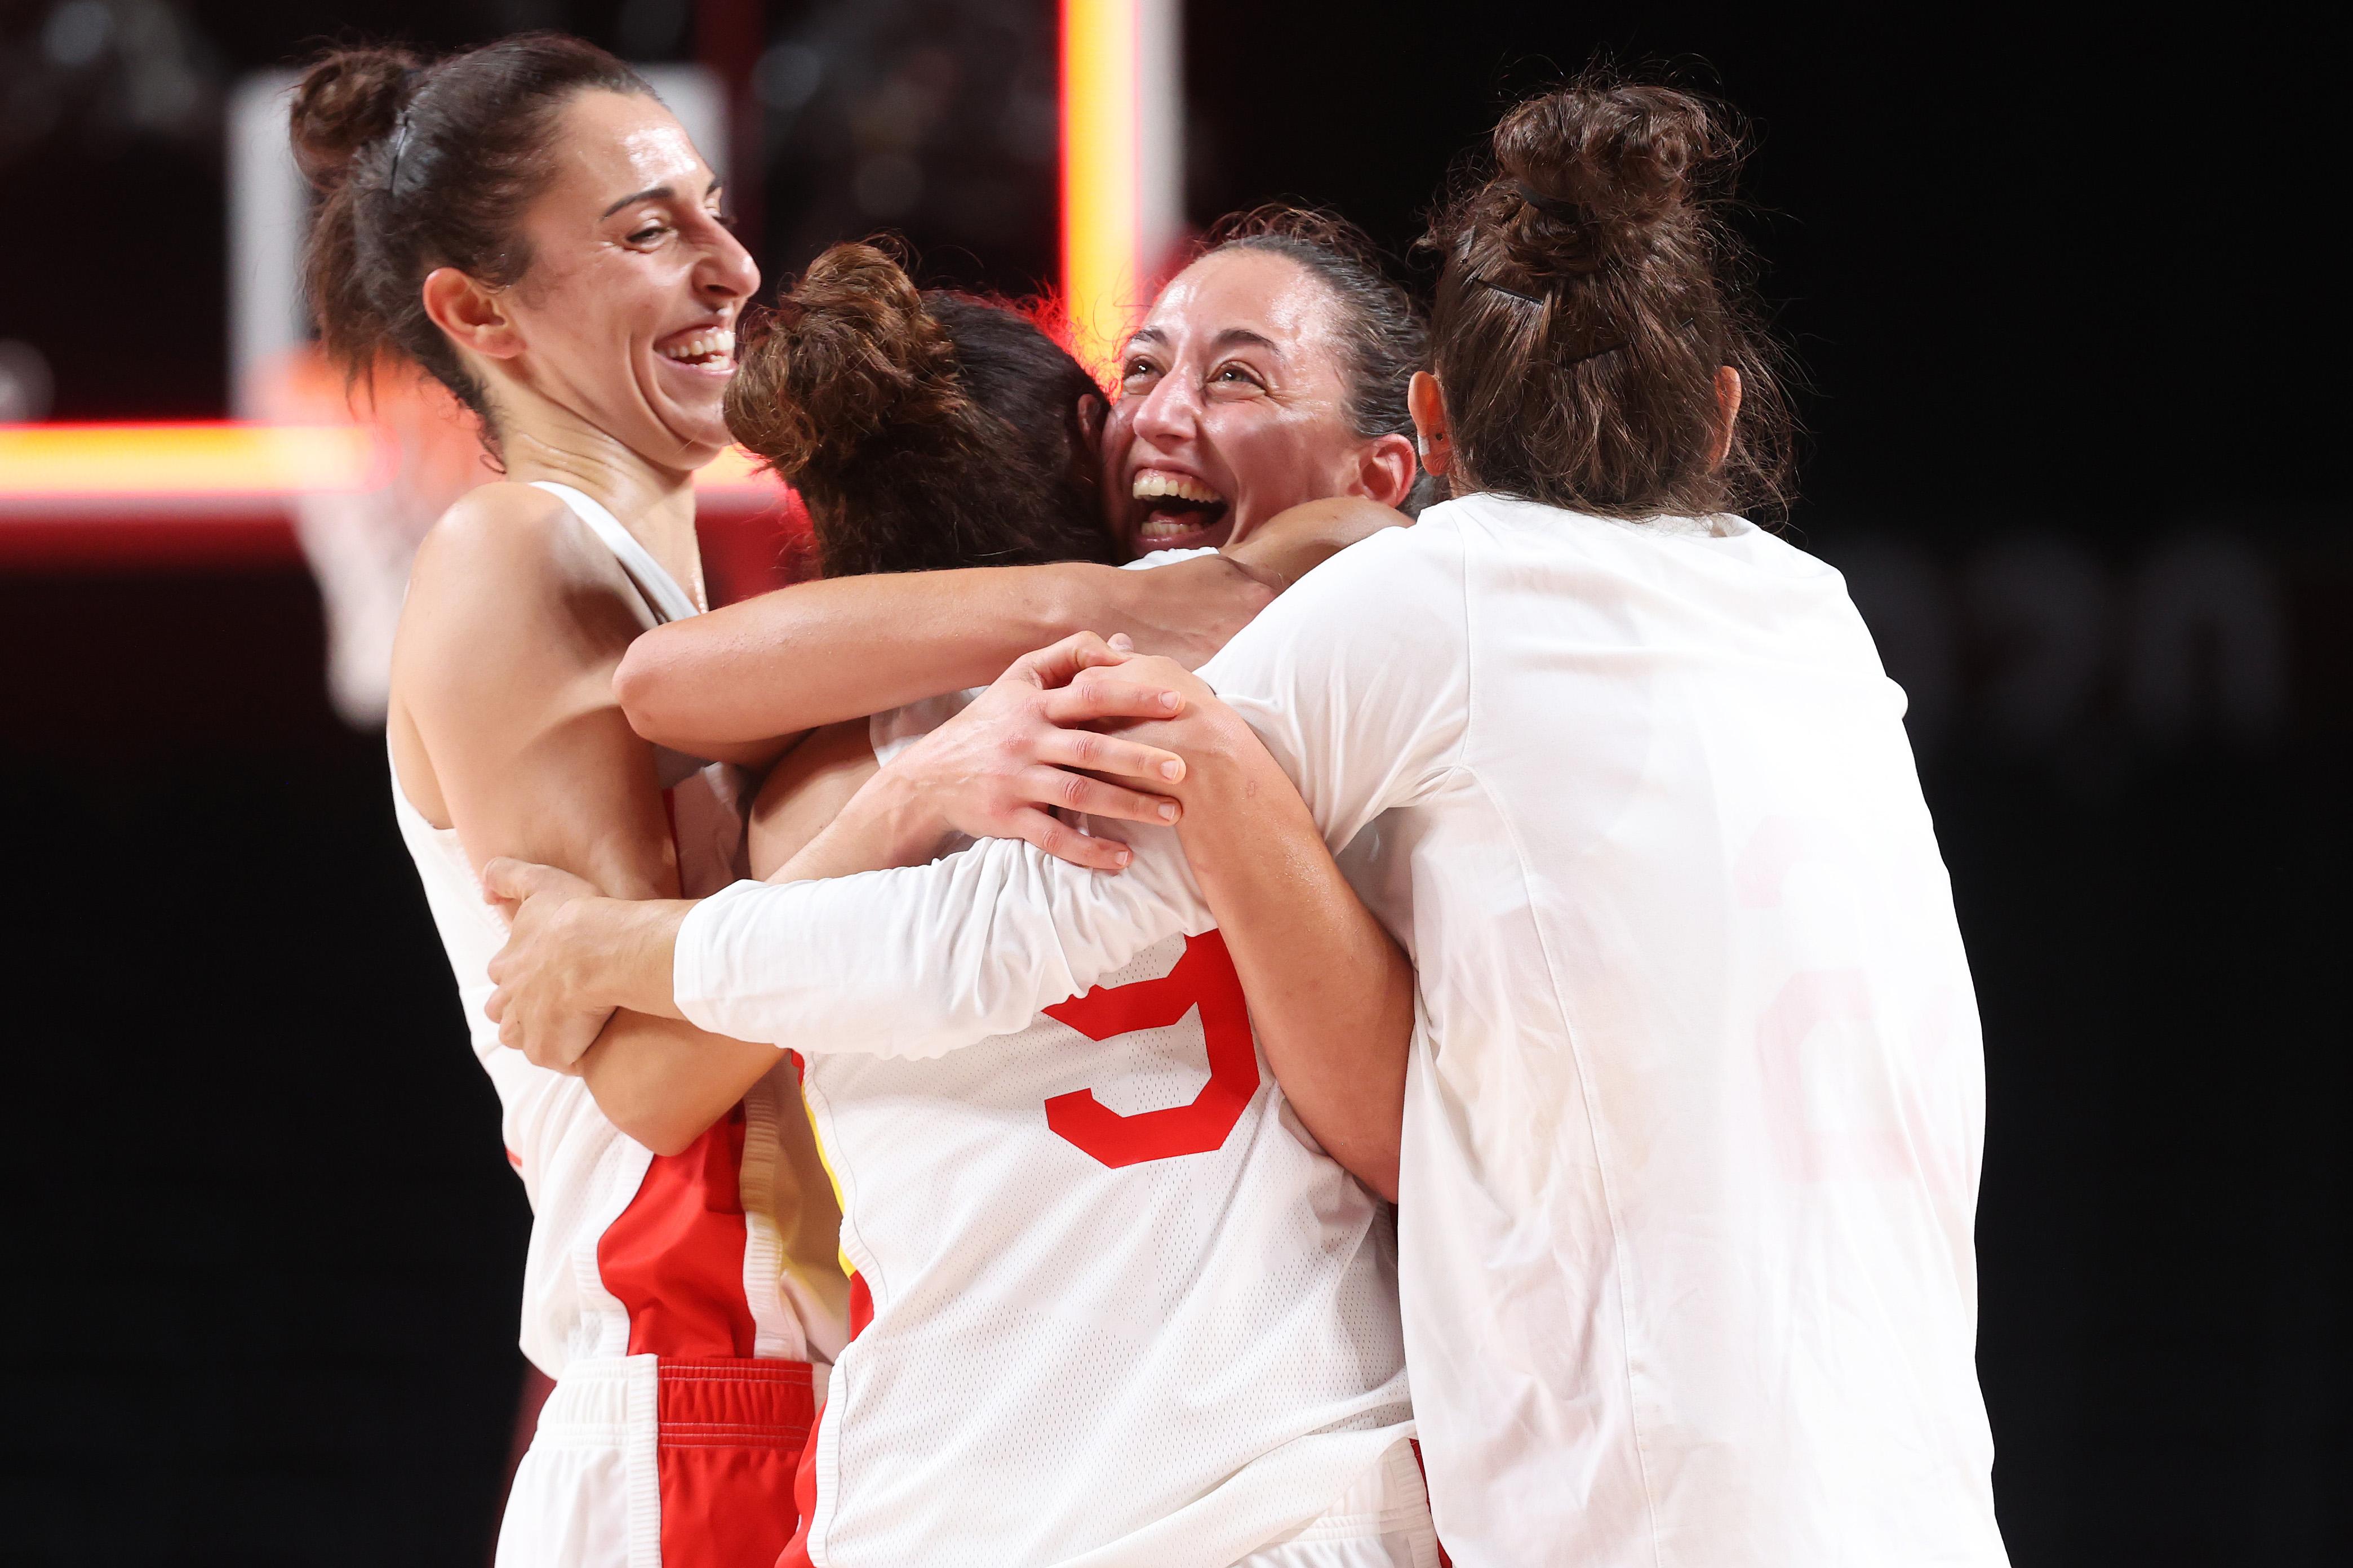 Spain v Serbia Women's Basketball - Olympics: Day 6